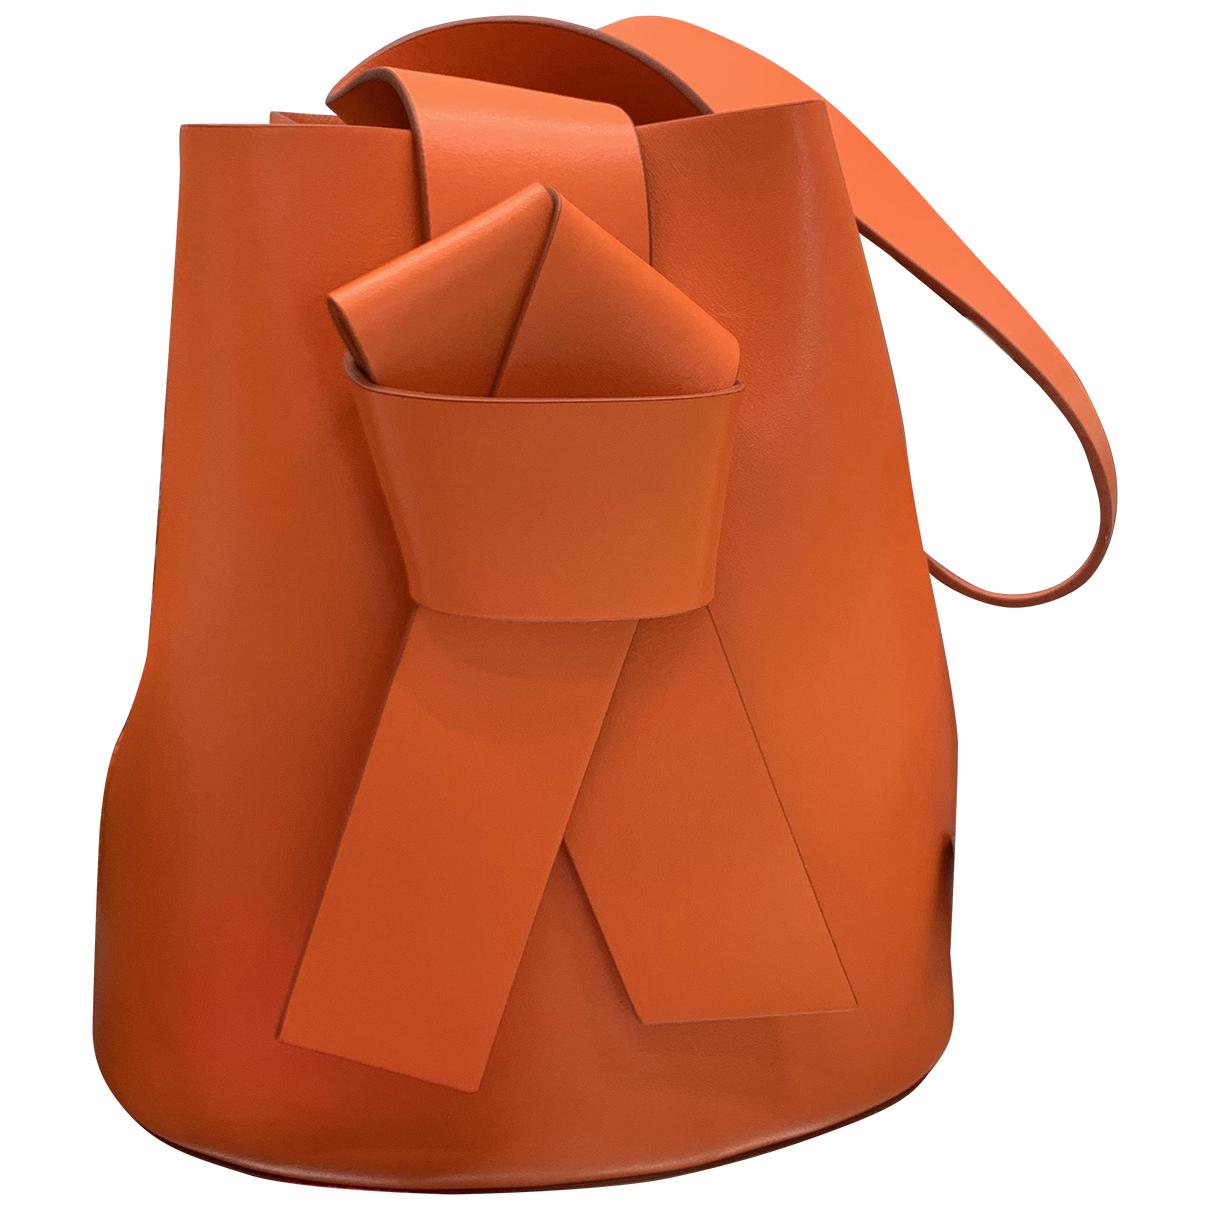 Acne Studios Musubi Orange Leather handbag for Women N